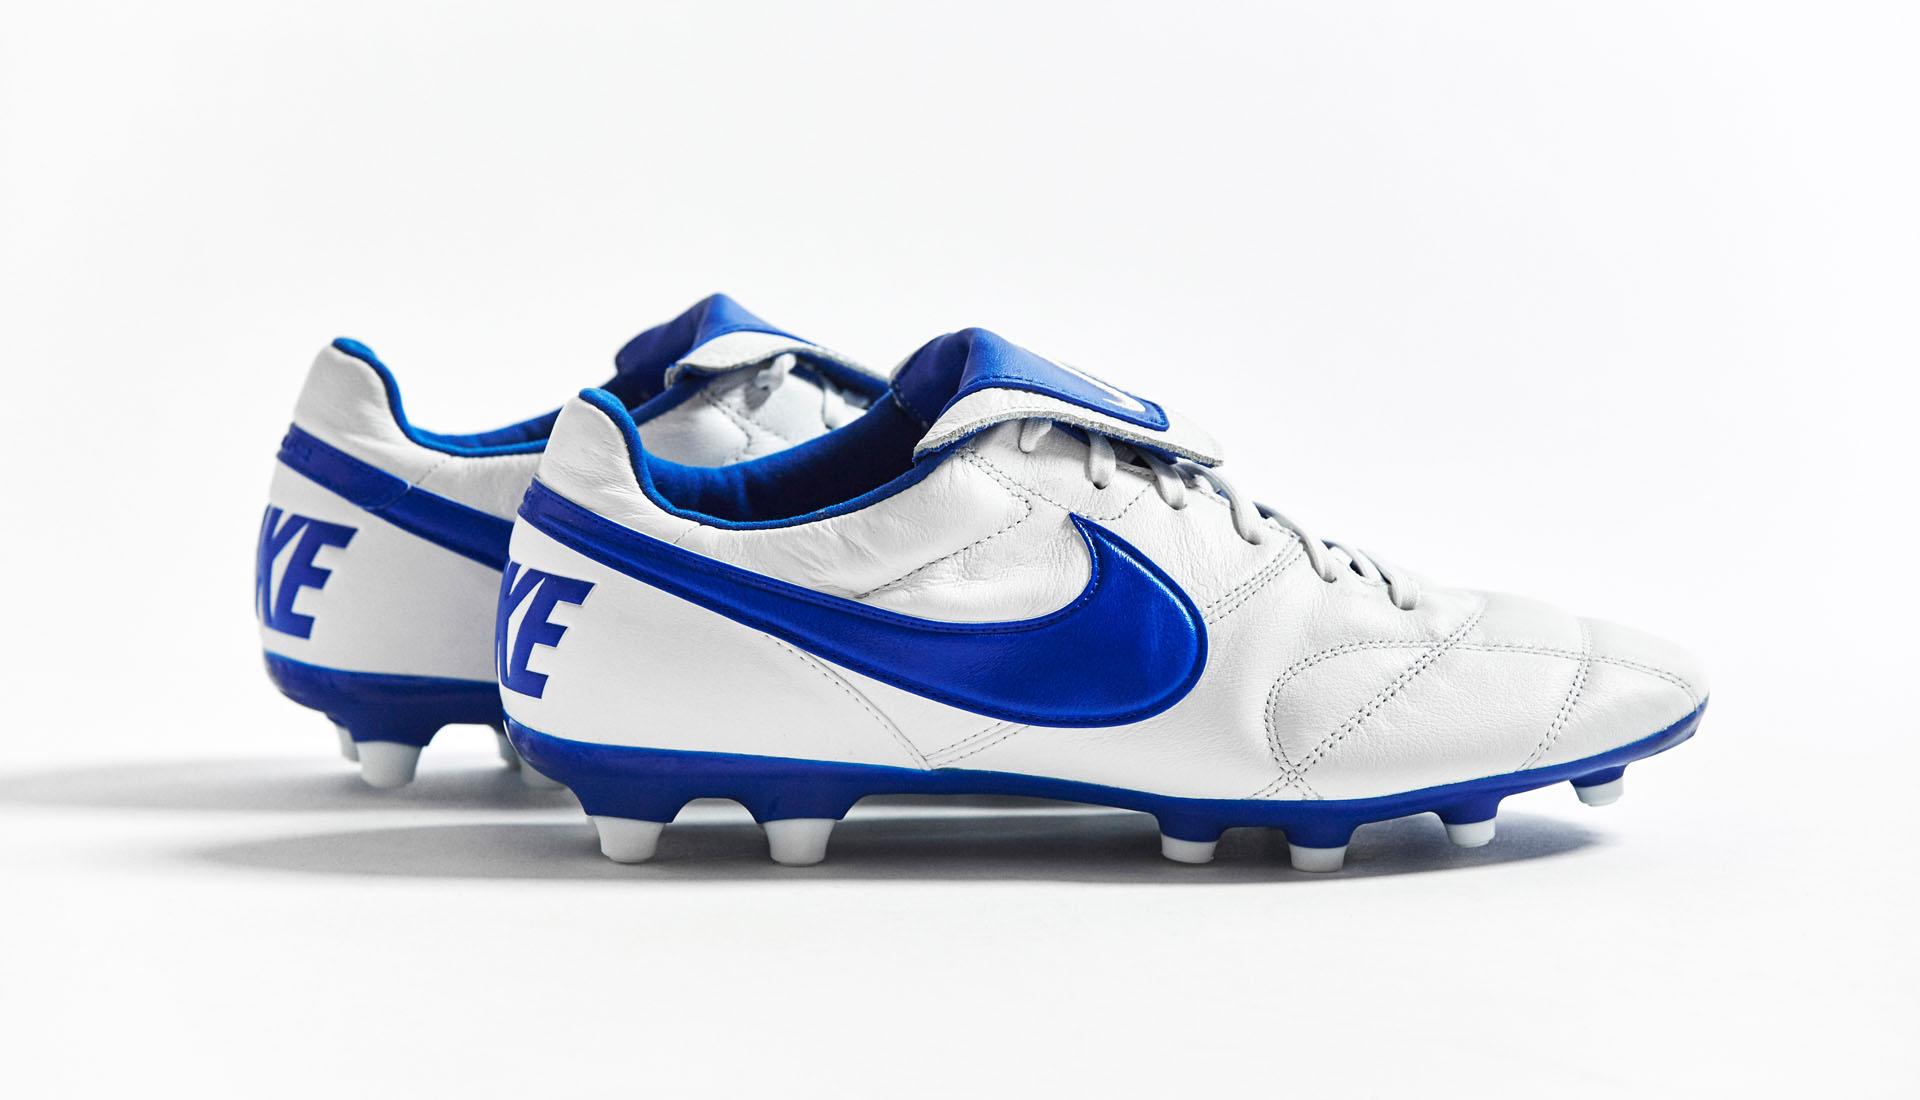 Nike Premier 2.0 Football Boots - SoccerBible 0c1cc88510d7